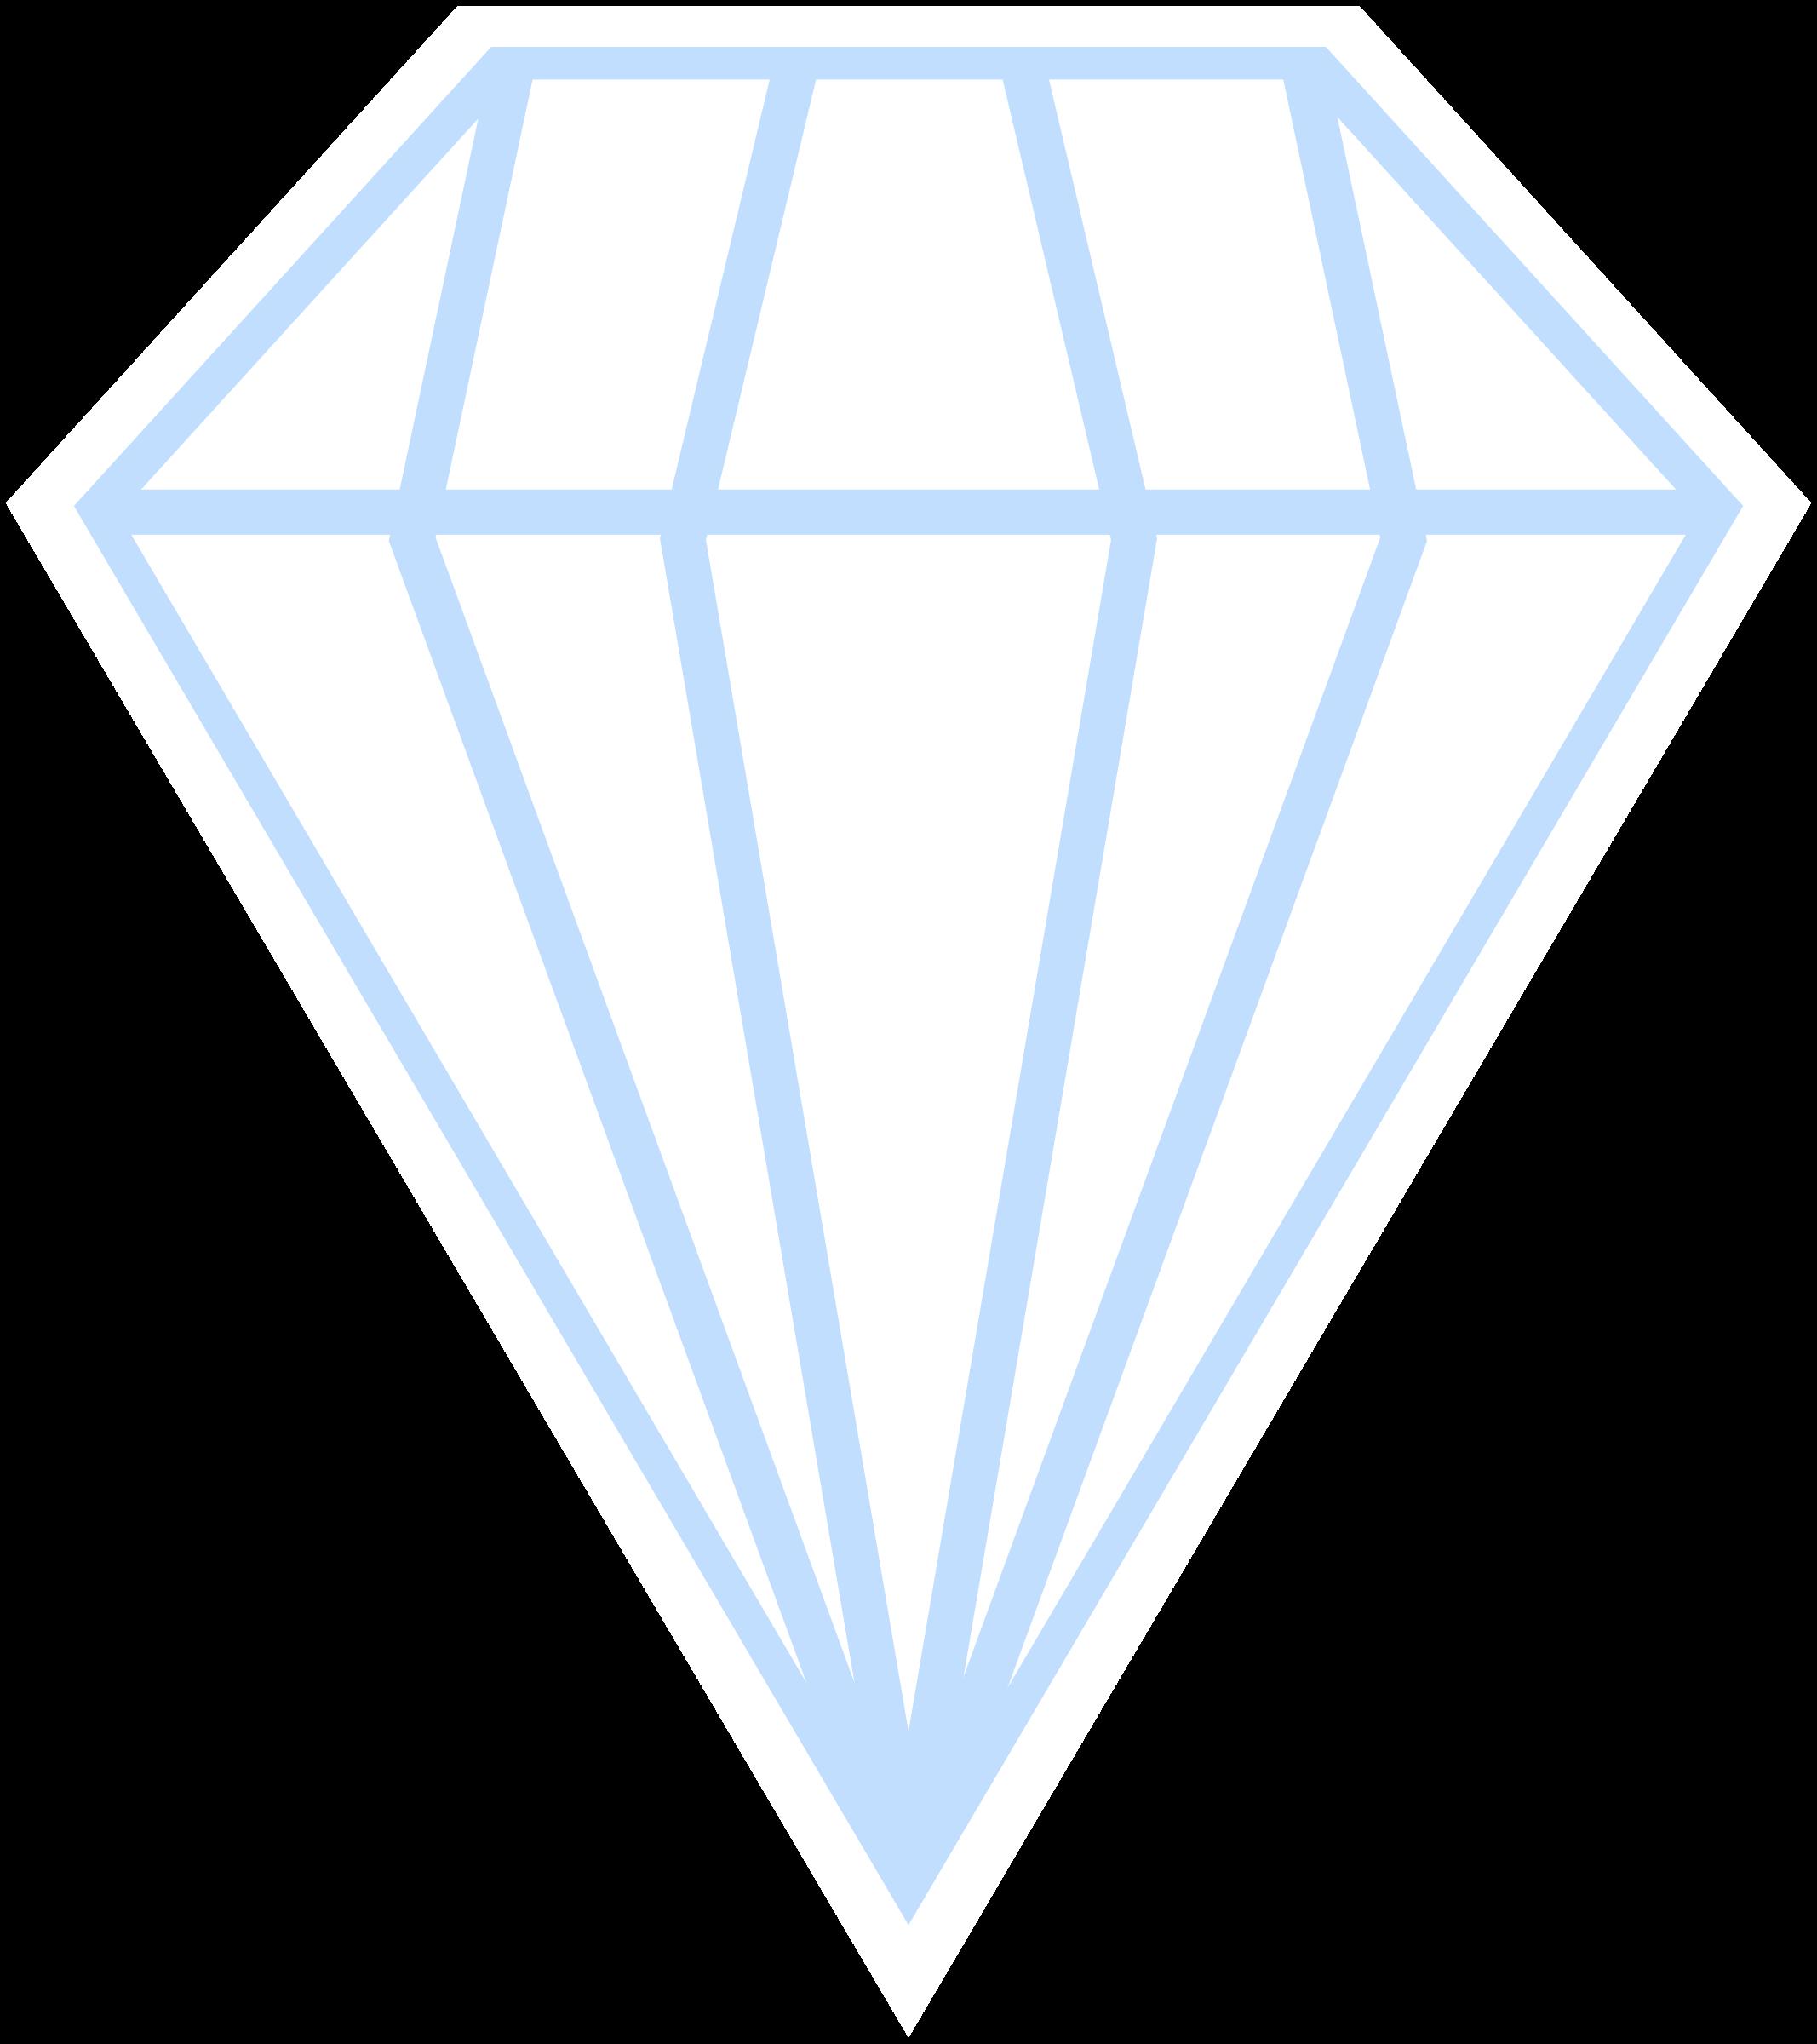 Diamonds clipart single. Howlite on toyhouse image